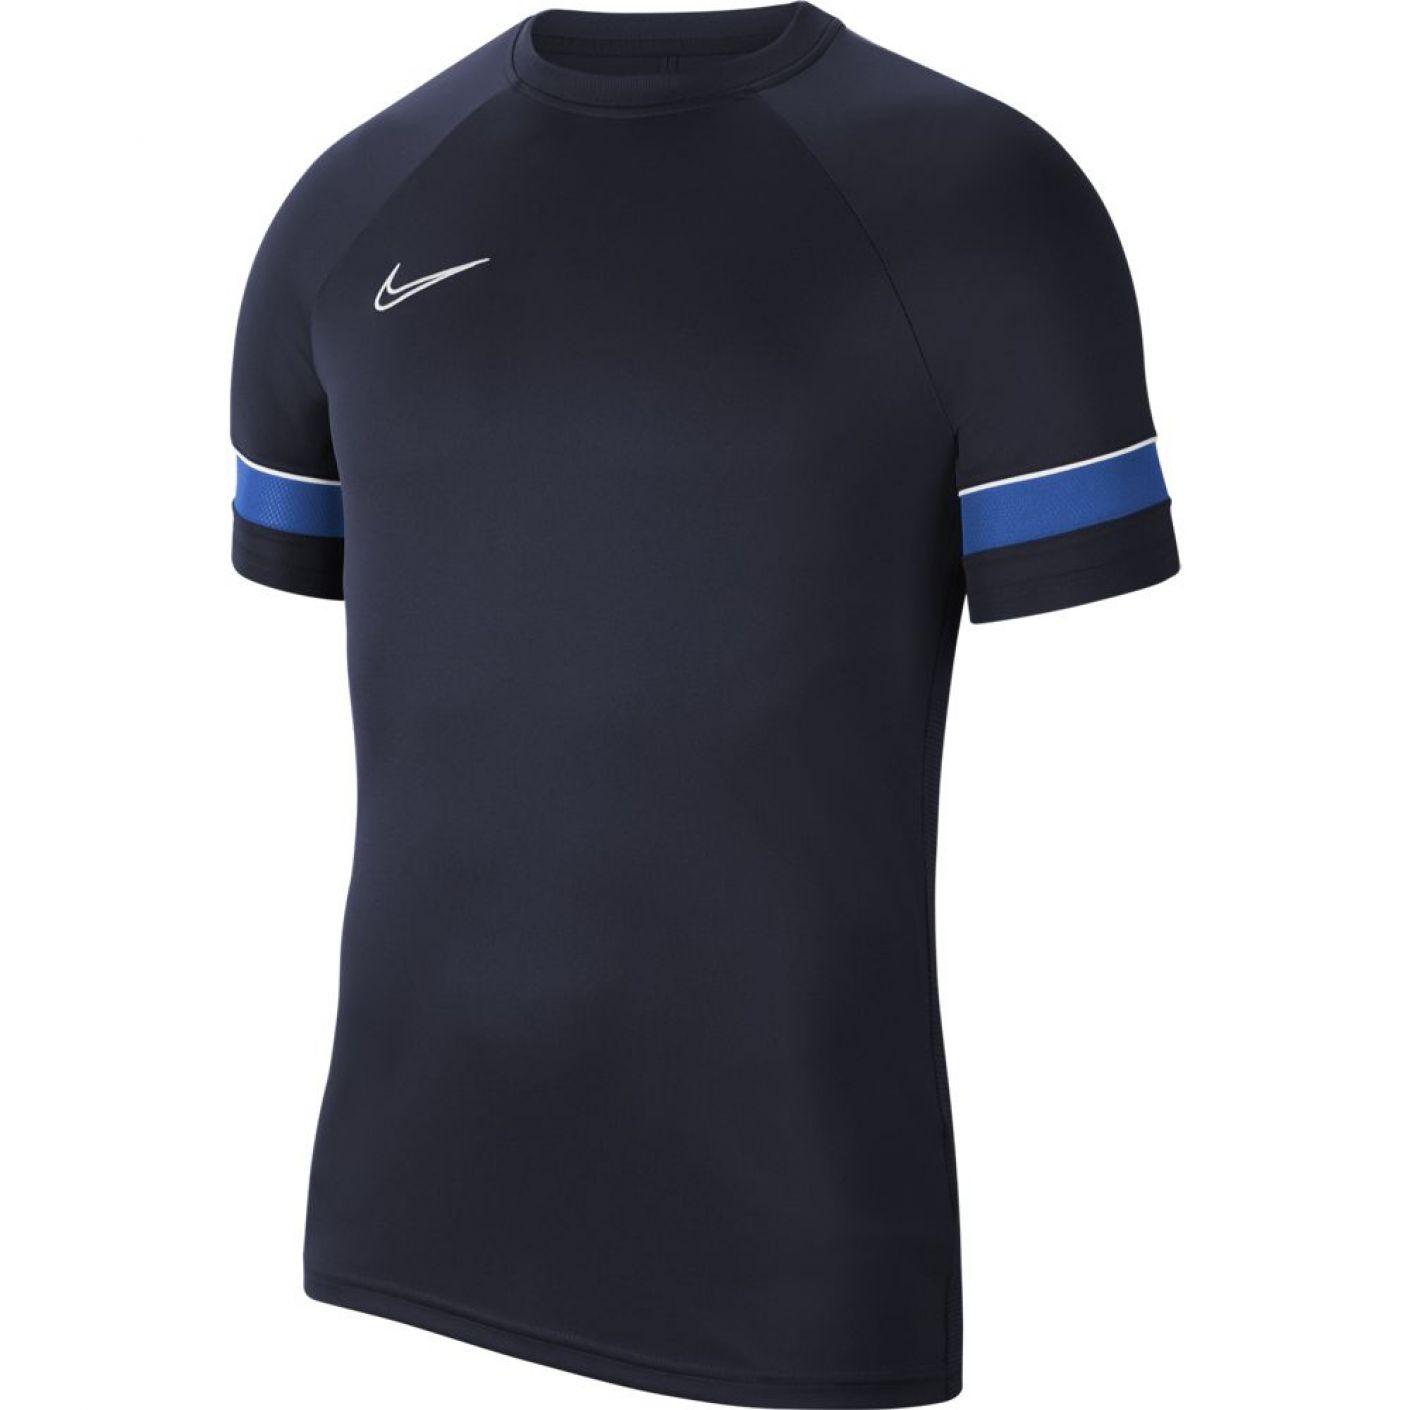 Nike Academy 21 Trainingsshirt Dri-FIT Donkerblauw Blauw - Voetbalshop.nl